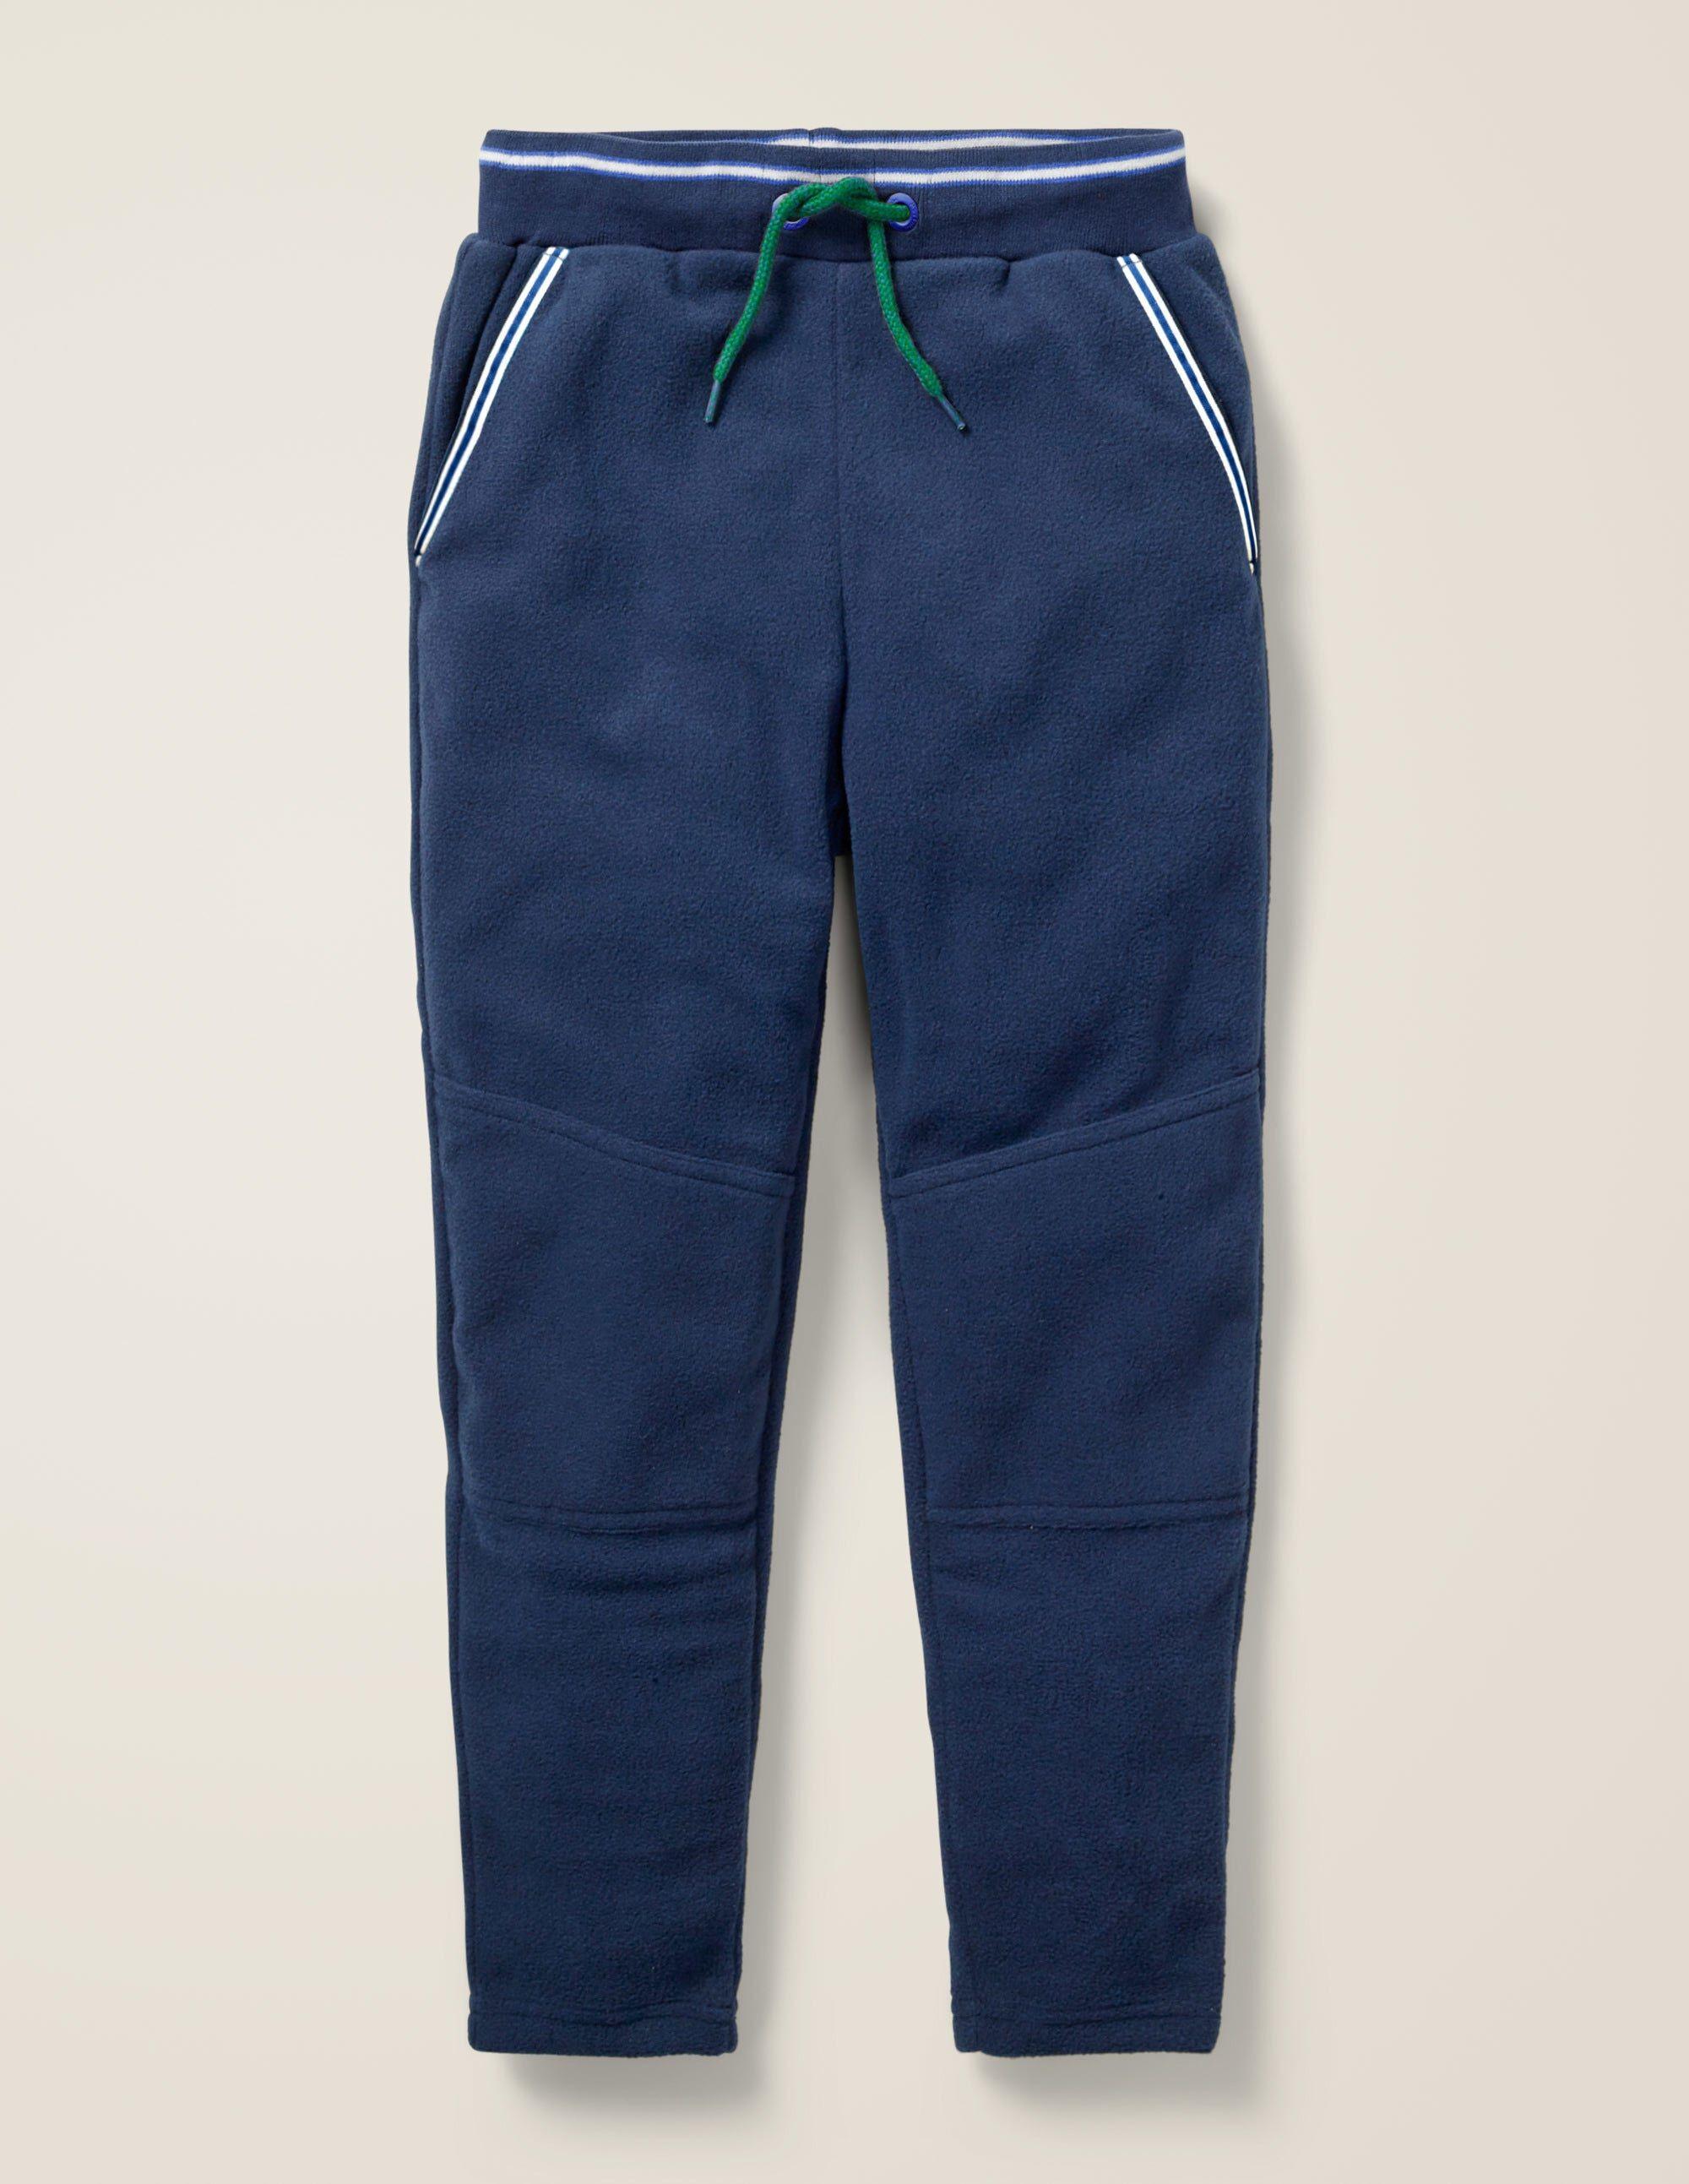 Mini Pantalon de survêtement en micro-polaire BLU Garçon Boden, Blue - 6a